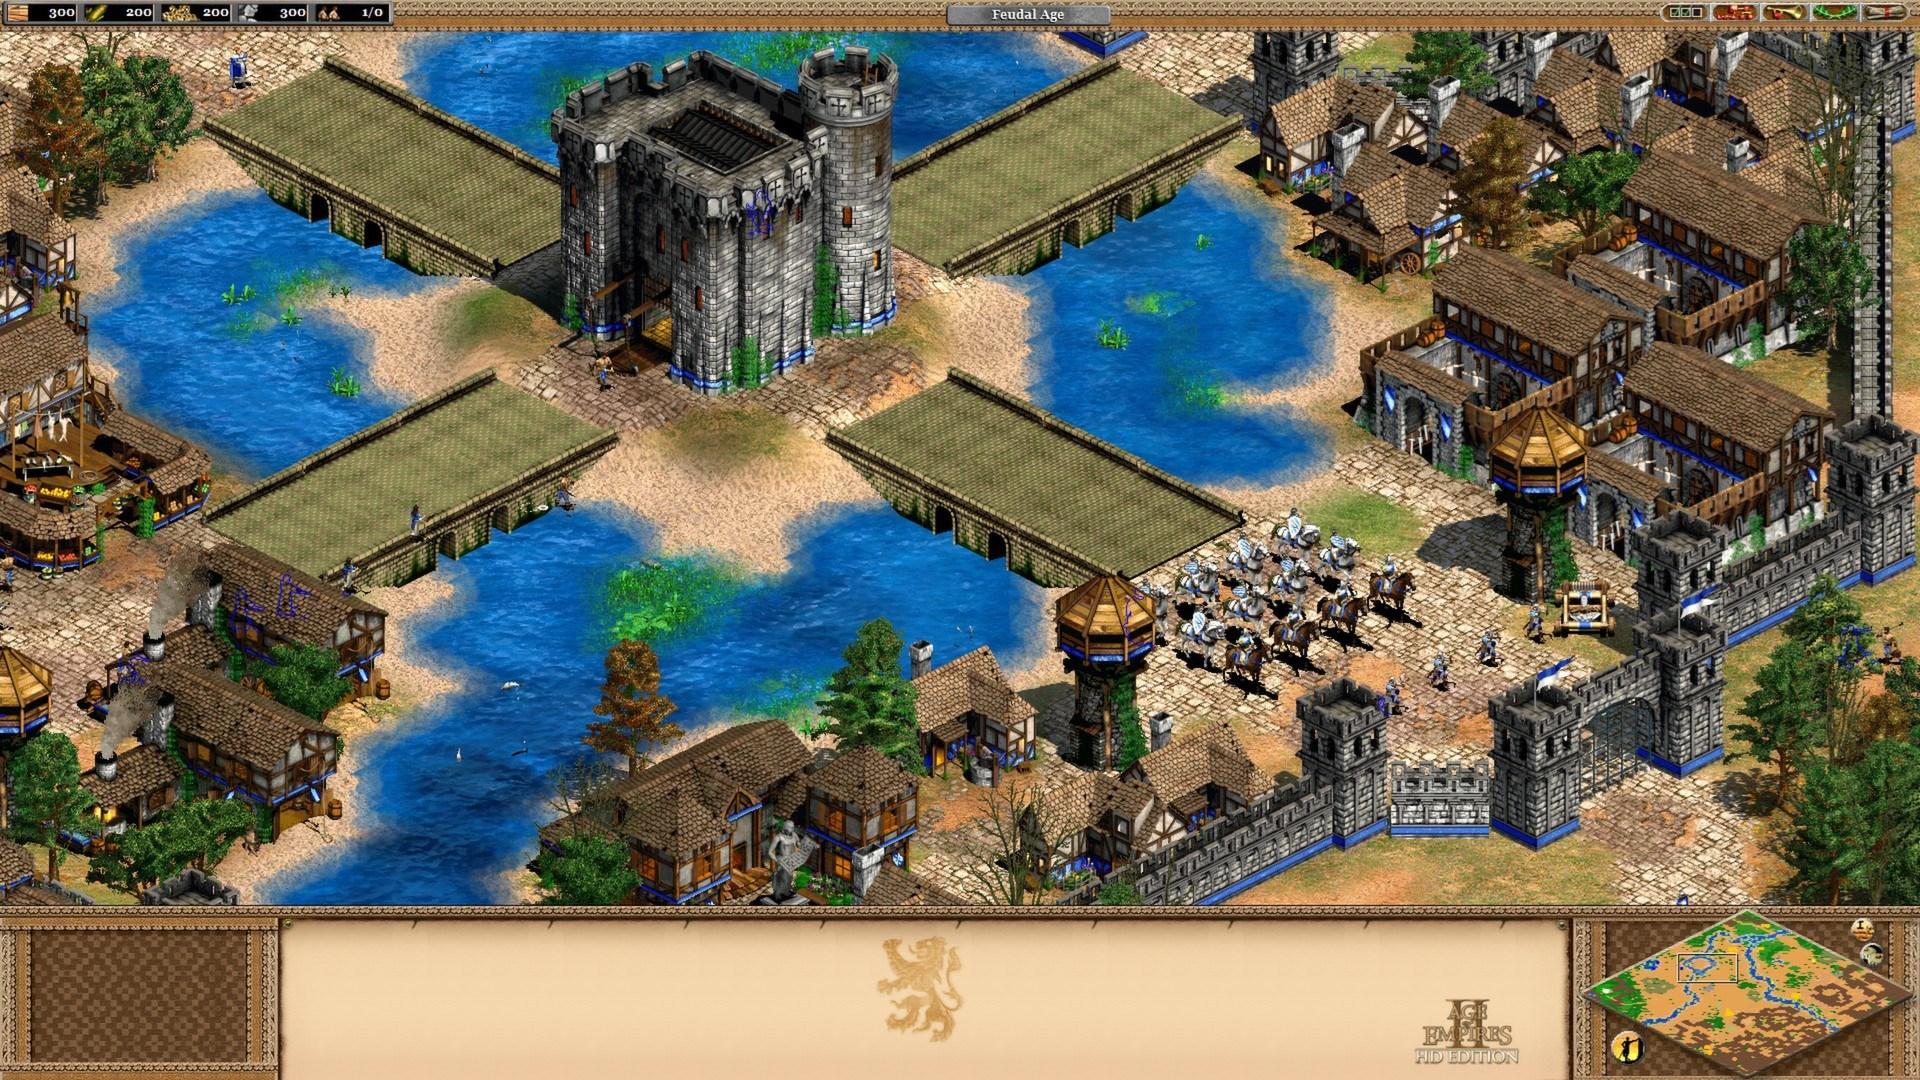 Age of Empires II HD Screenshot 1